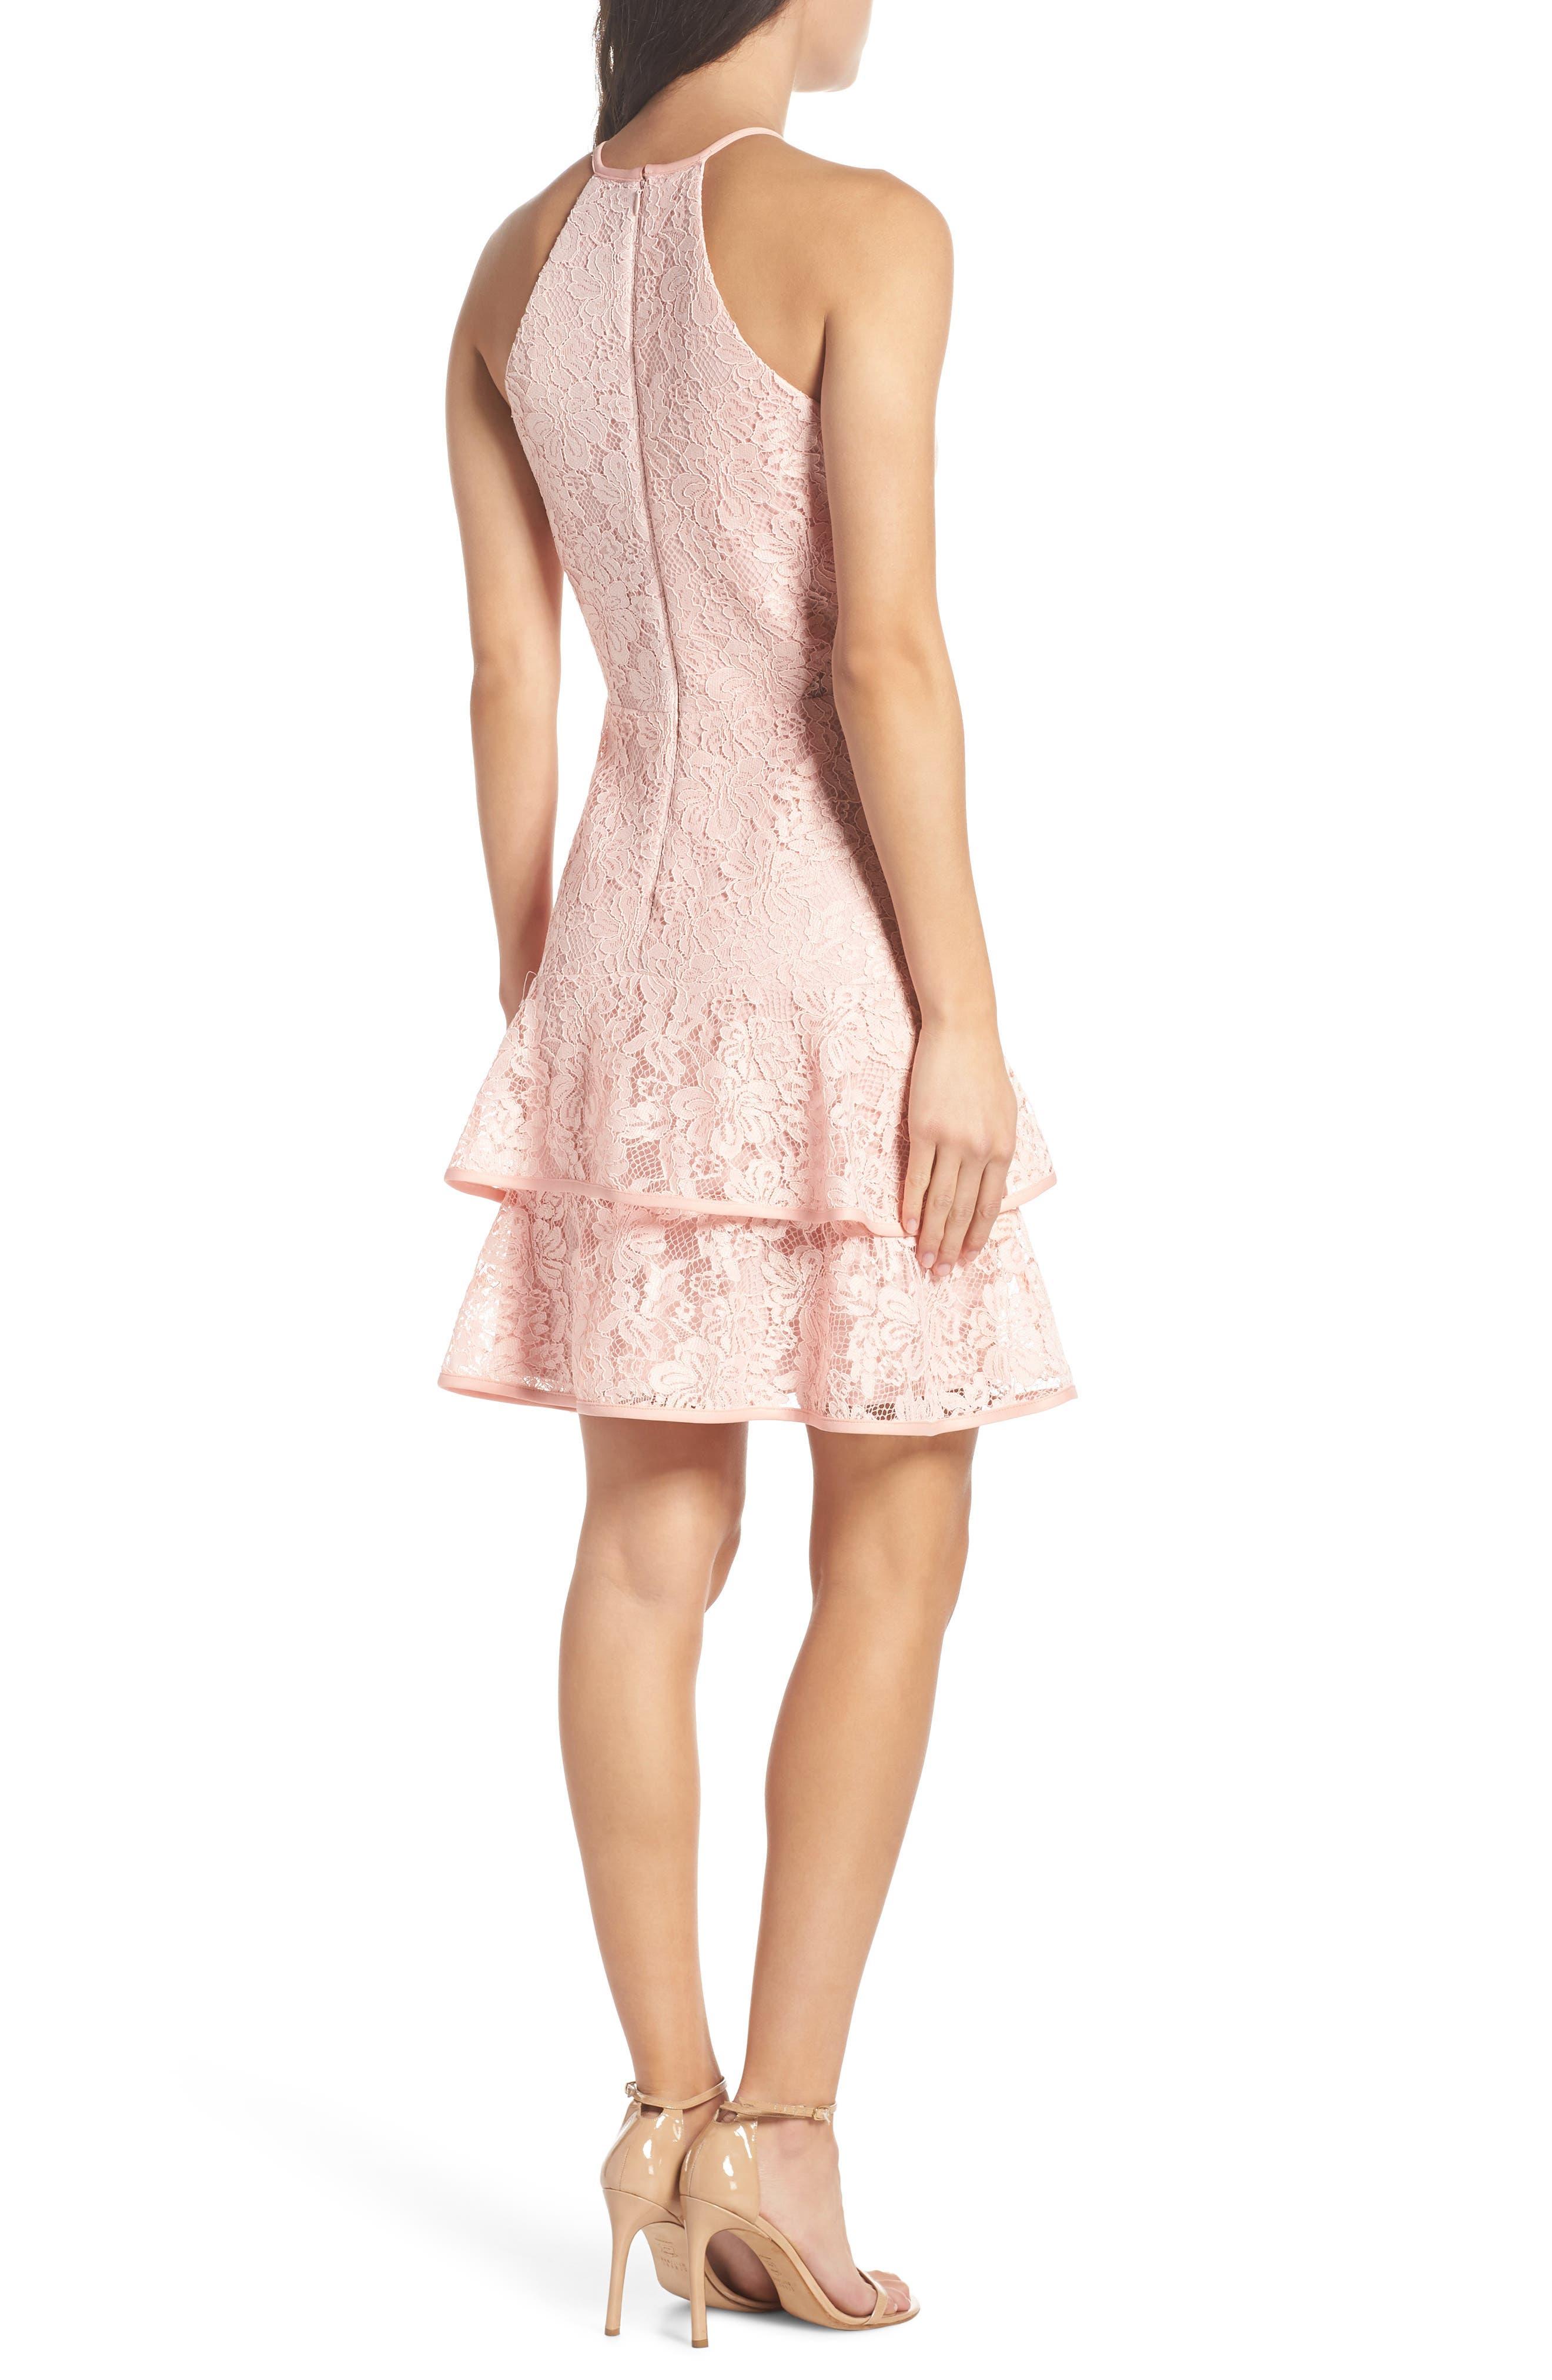 Ruffle Tier Lace Party Dress,                             Alternate thumbnail 2, color,                             680